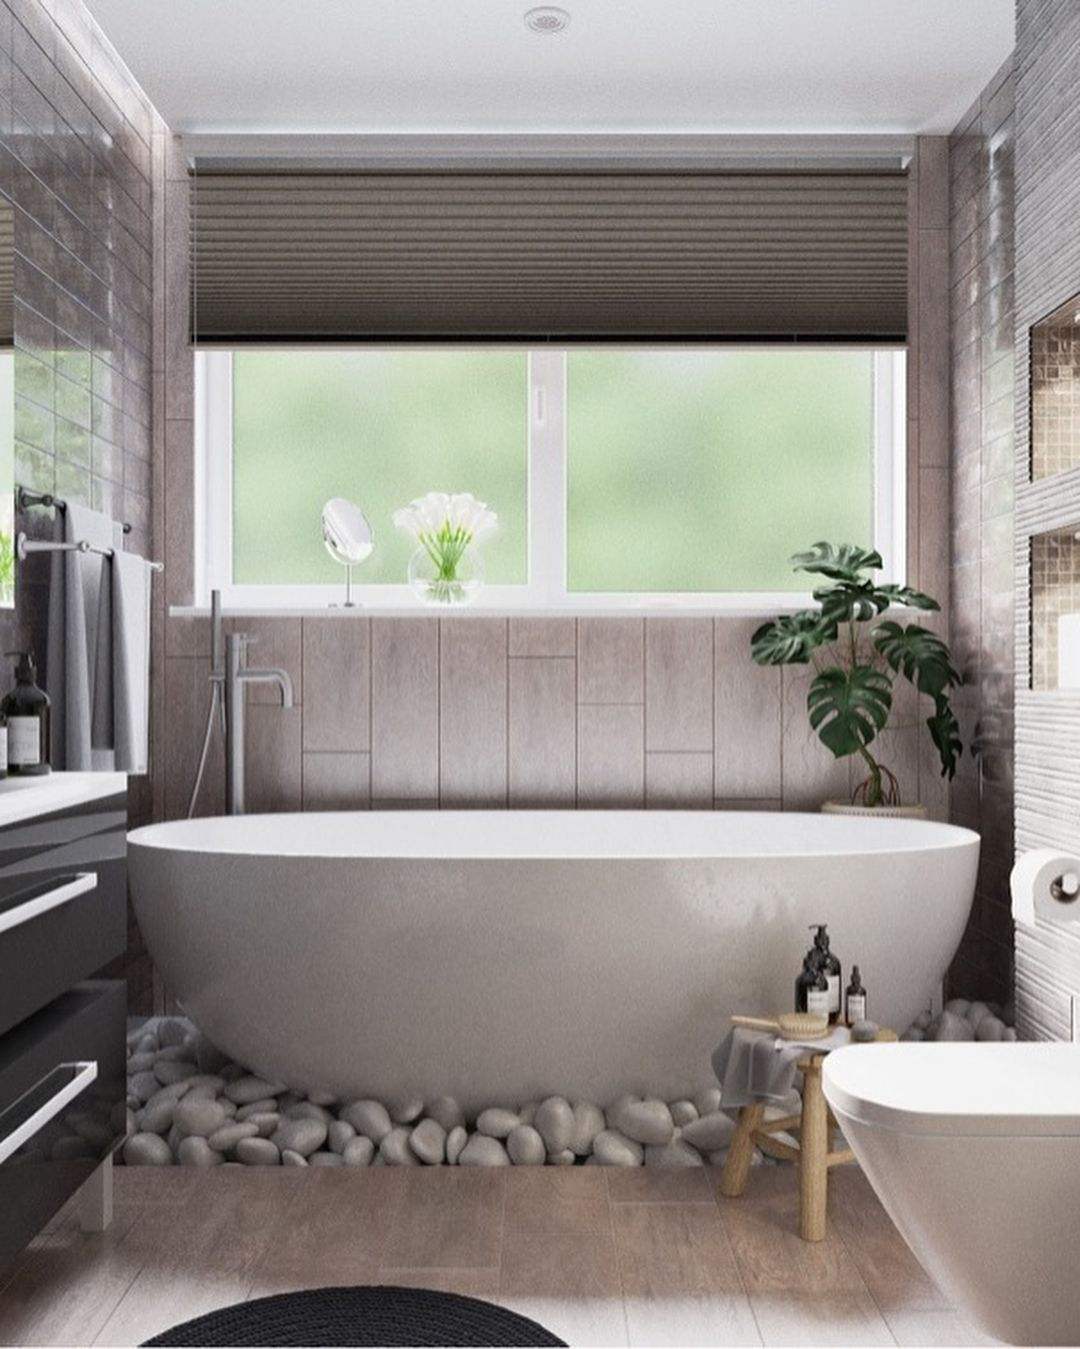 Small Bathrooms Are A Great Place To Get Creative Here Are The Latest Bathroom Trends For 2019 Bathroom Mikra Mpania Diakosmhsh Mpaniwn Anakainiseis Mpaniwn